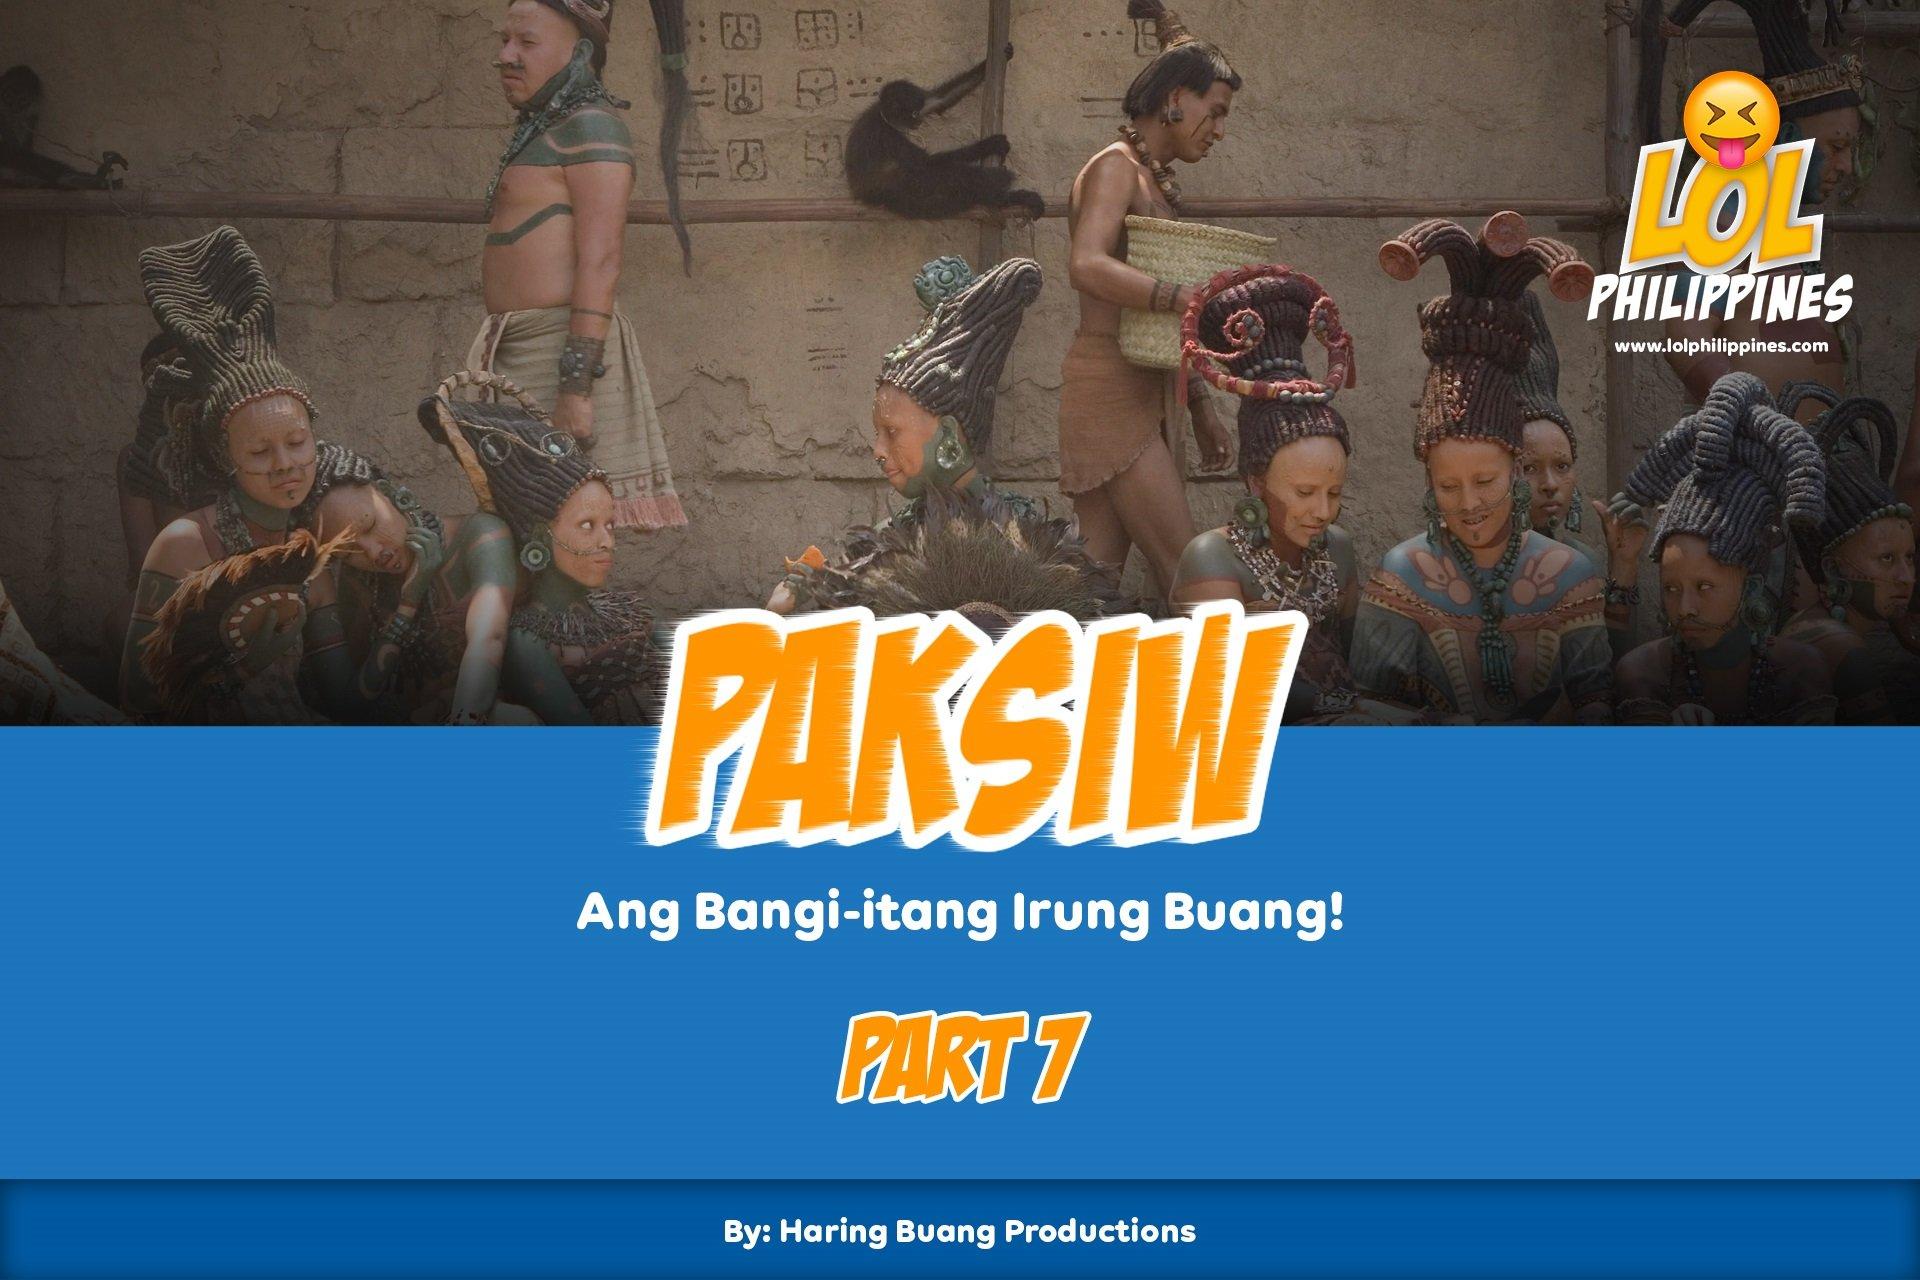 LOL Philippines Paksiw Part 7